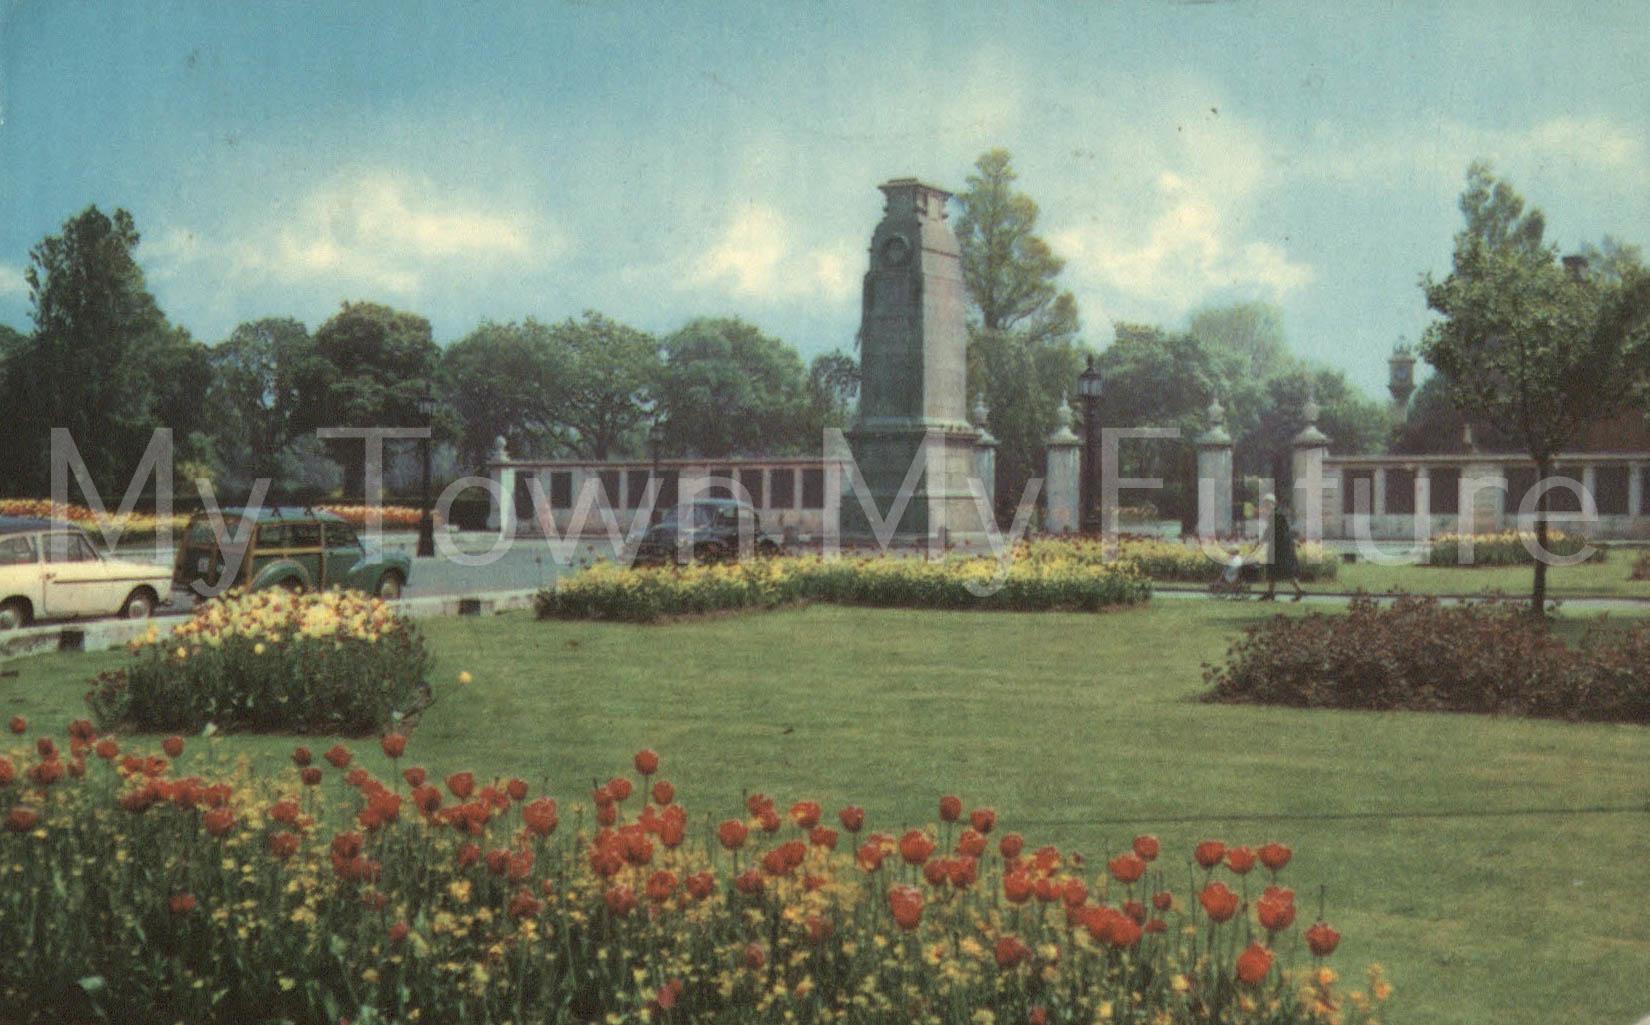 Albert Park - Postcard - near Cenotaph - to Mrs W Crowther, Postmark - 1970s